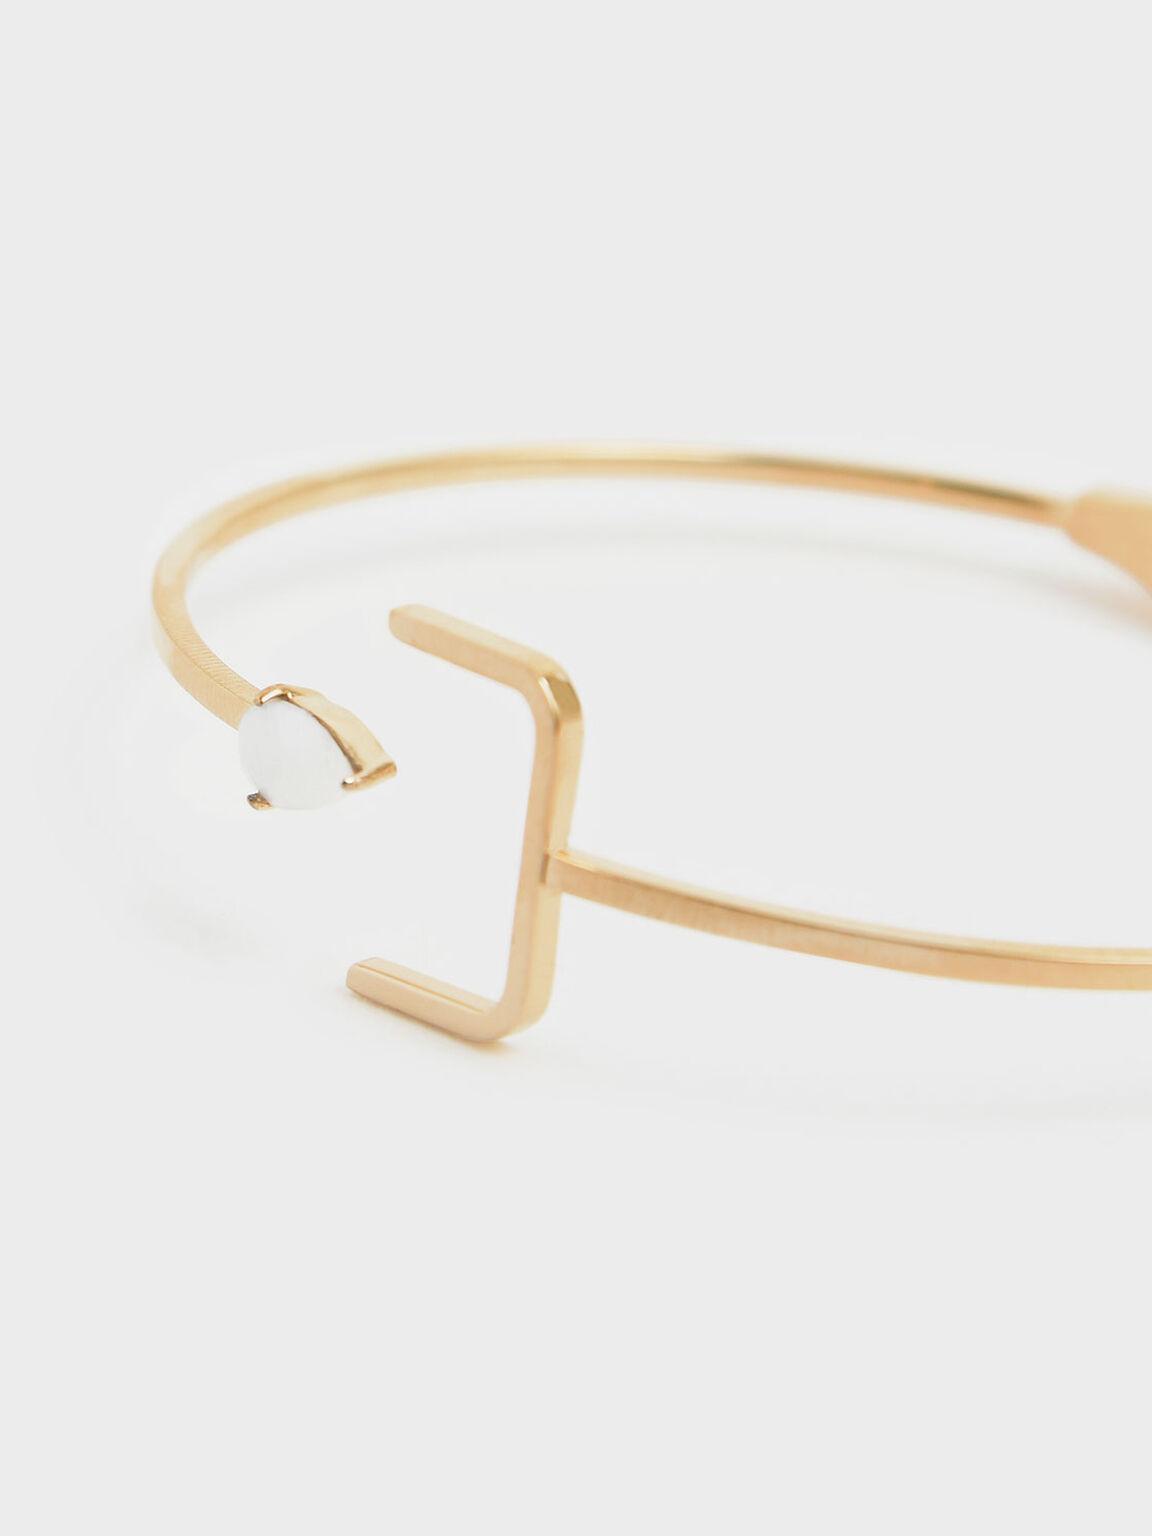 Moonstone Cuff Bracelet, Gold, hi-res